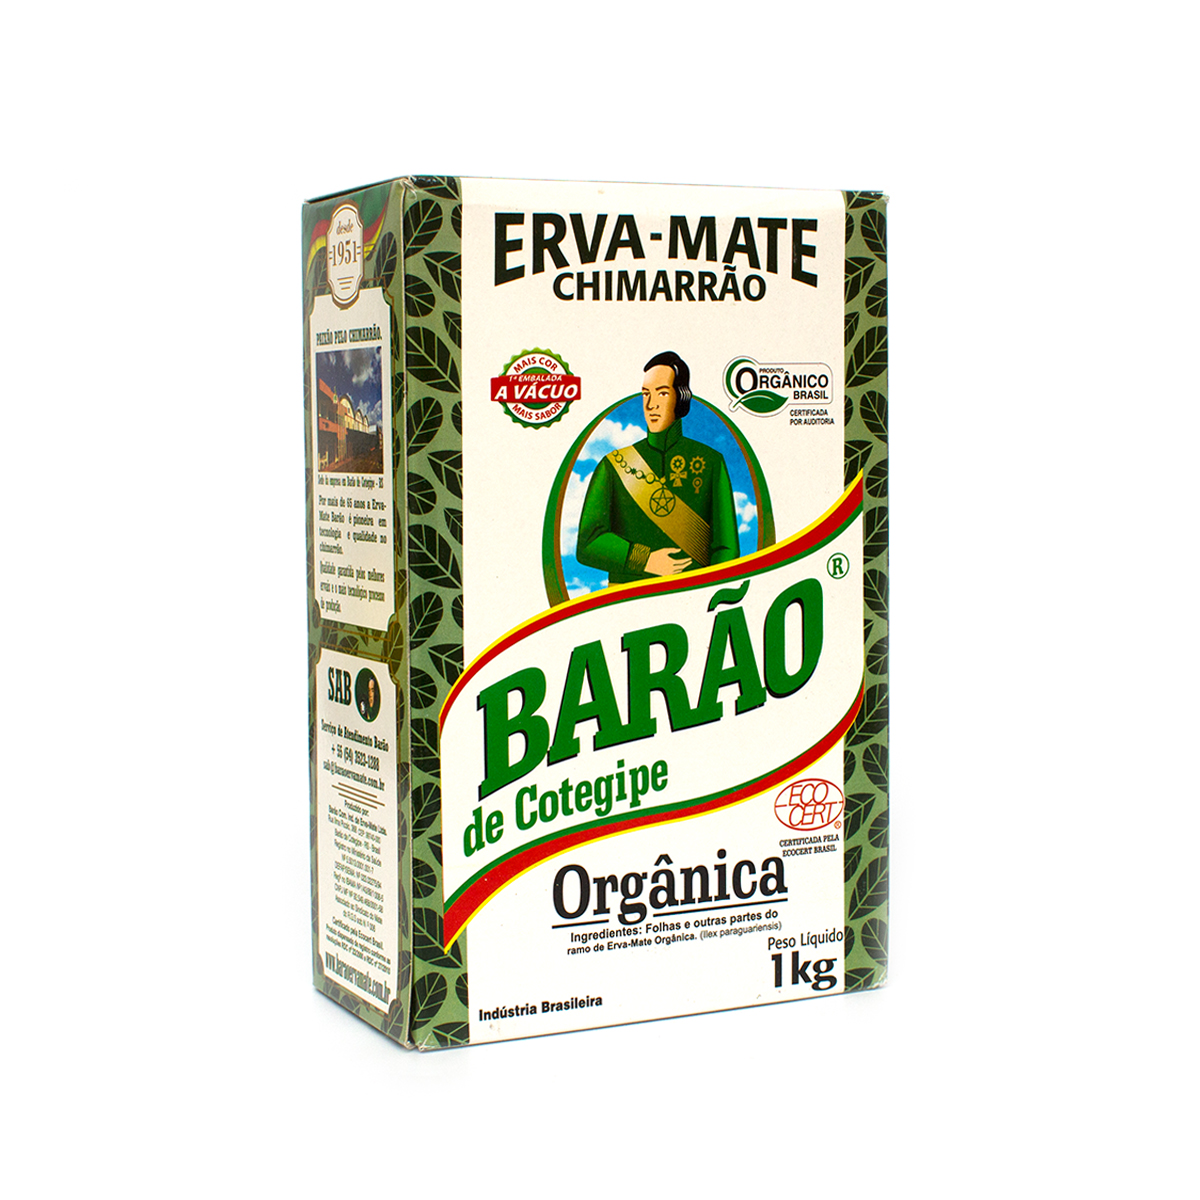 Мате Barao De Cotegipe Organica, 1000 г